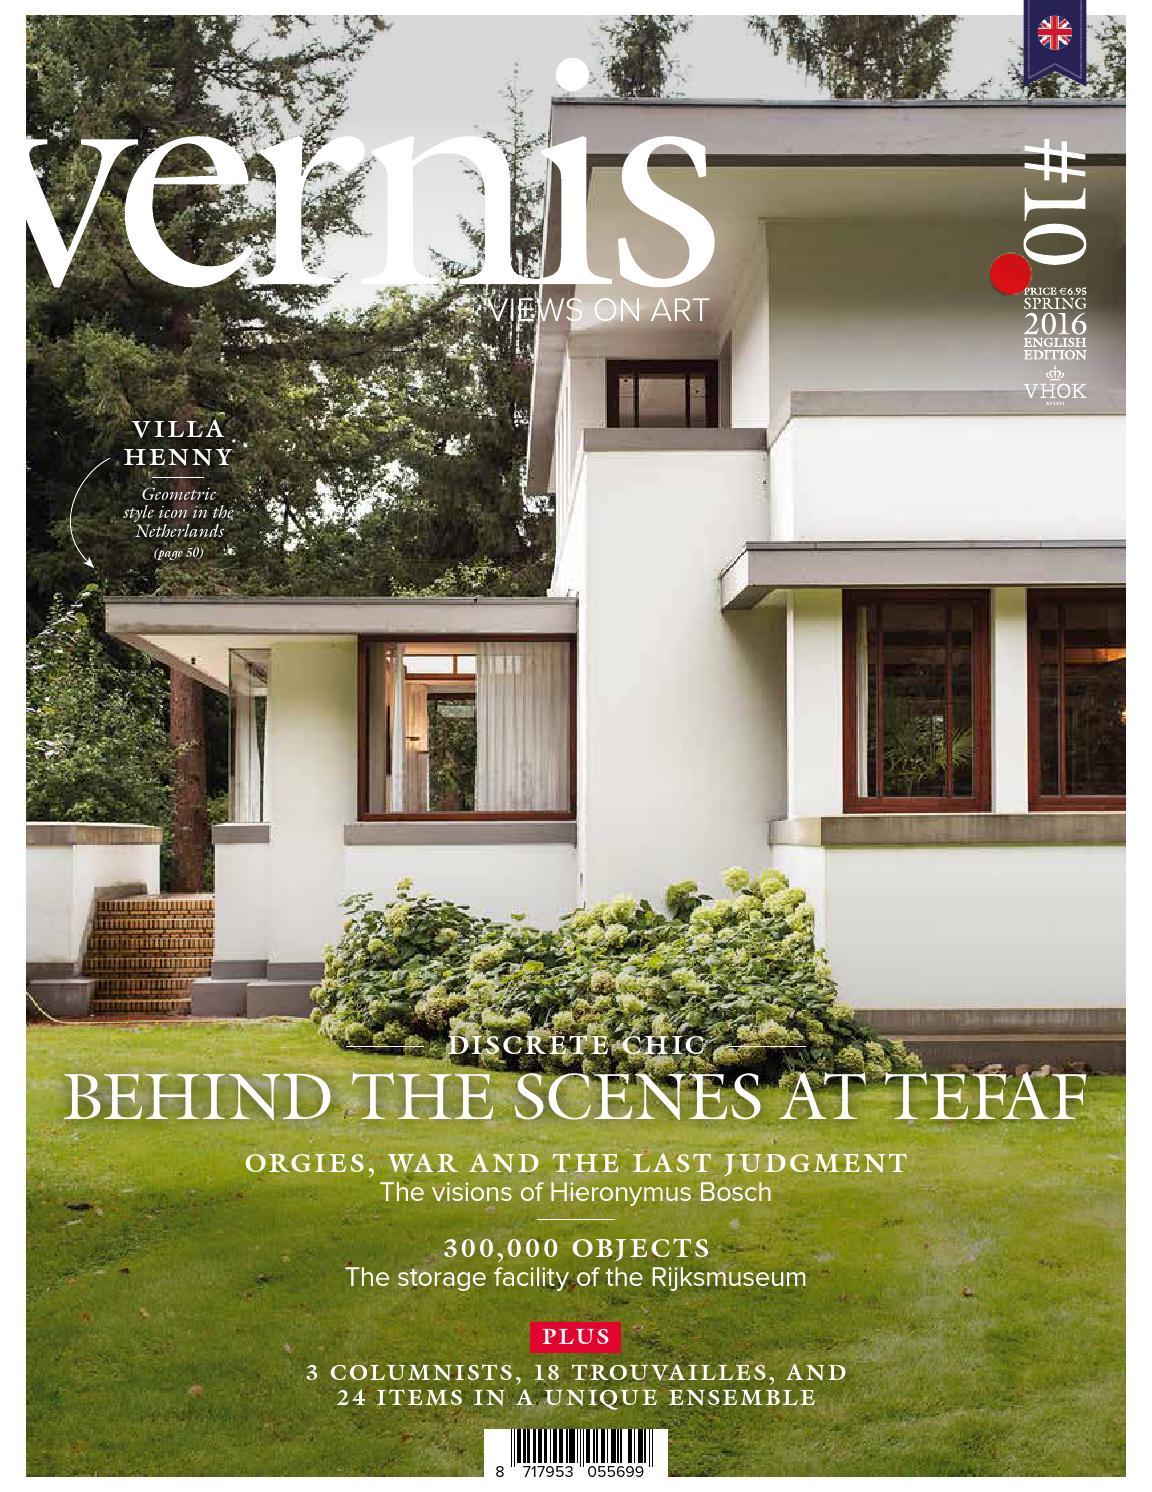 Vernis Magazine Edition10 English Edition By Koninklijke Vhok Issuu The Olive House Esther Wide Drawer White